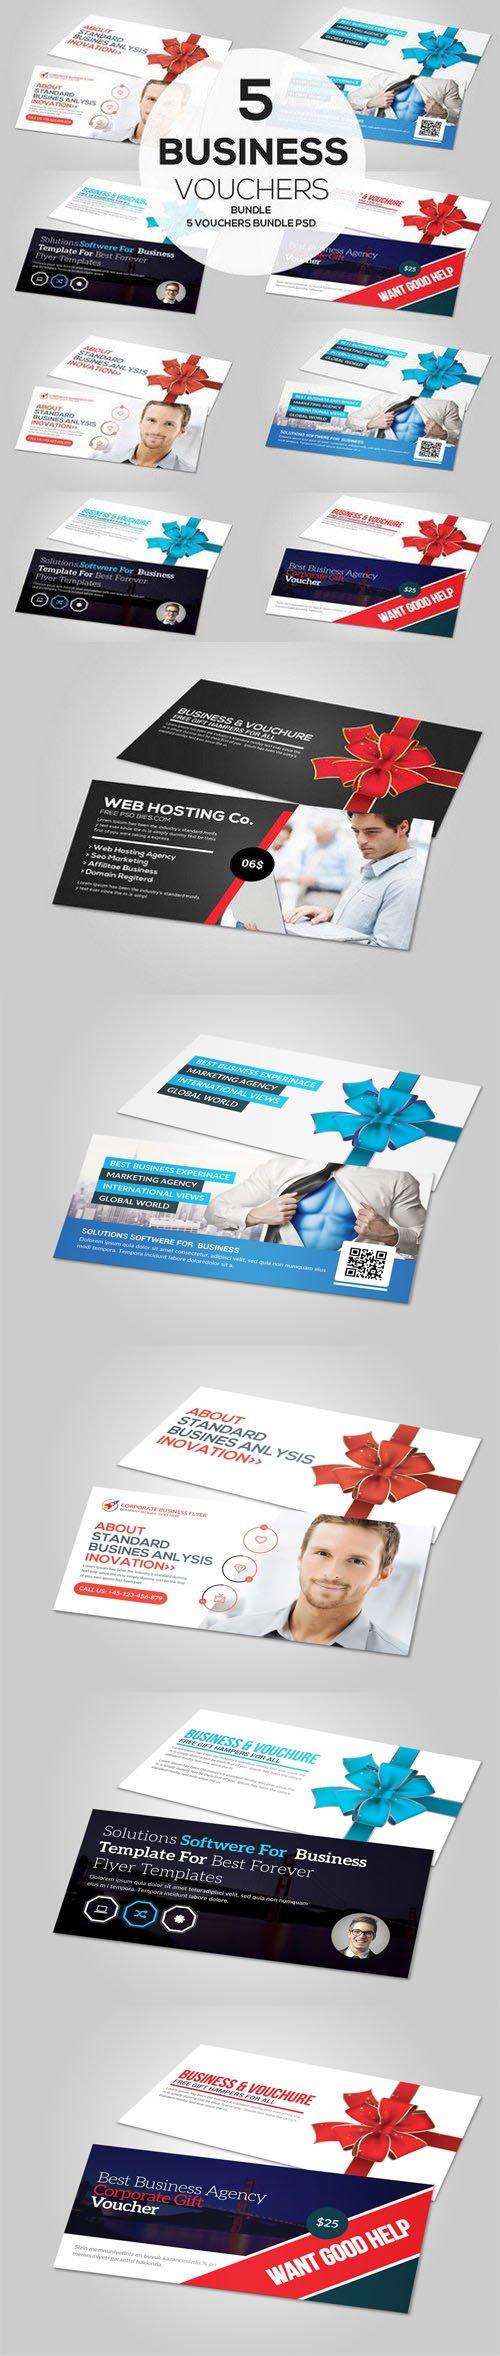 5 Business Vouchers Bundle - Gift Cards PSD Mockups Templates